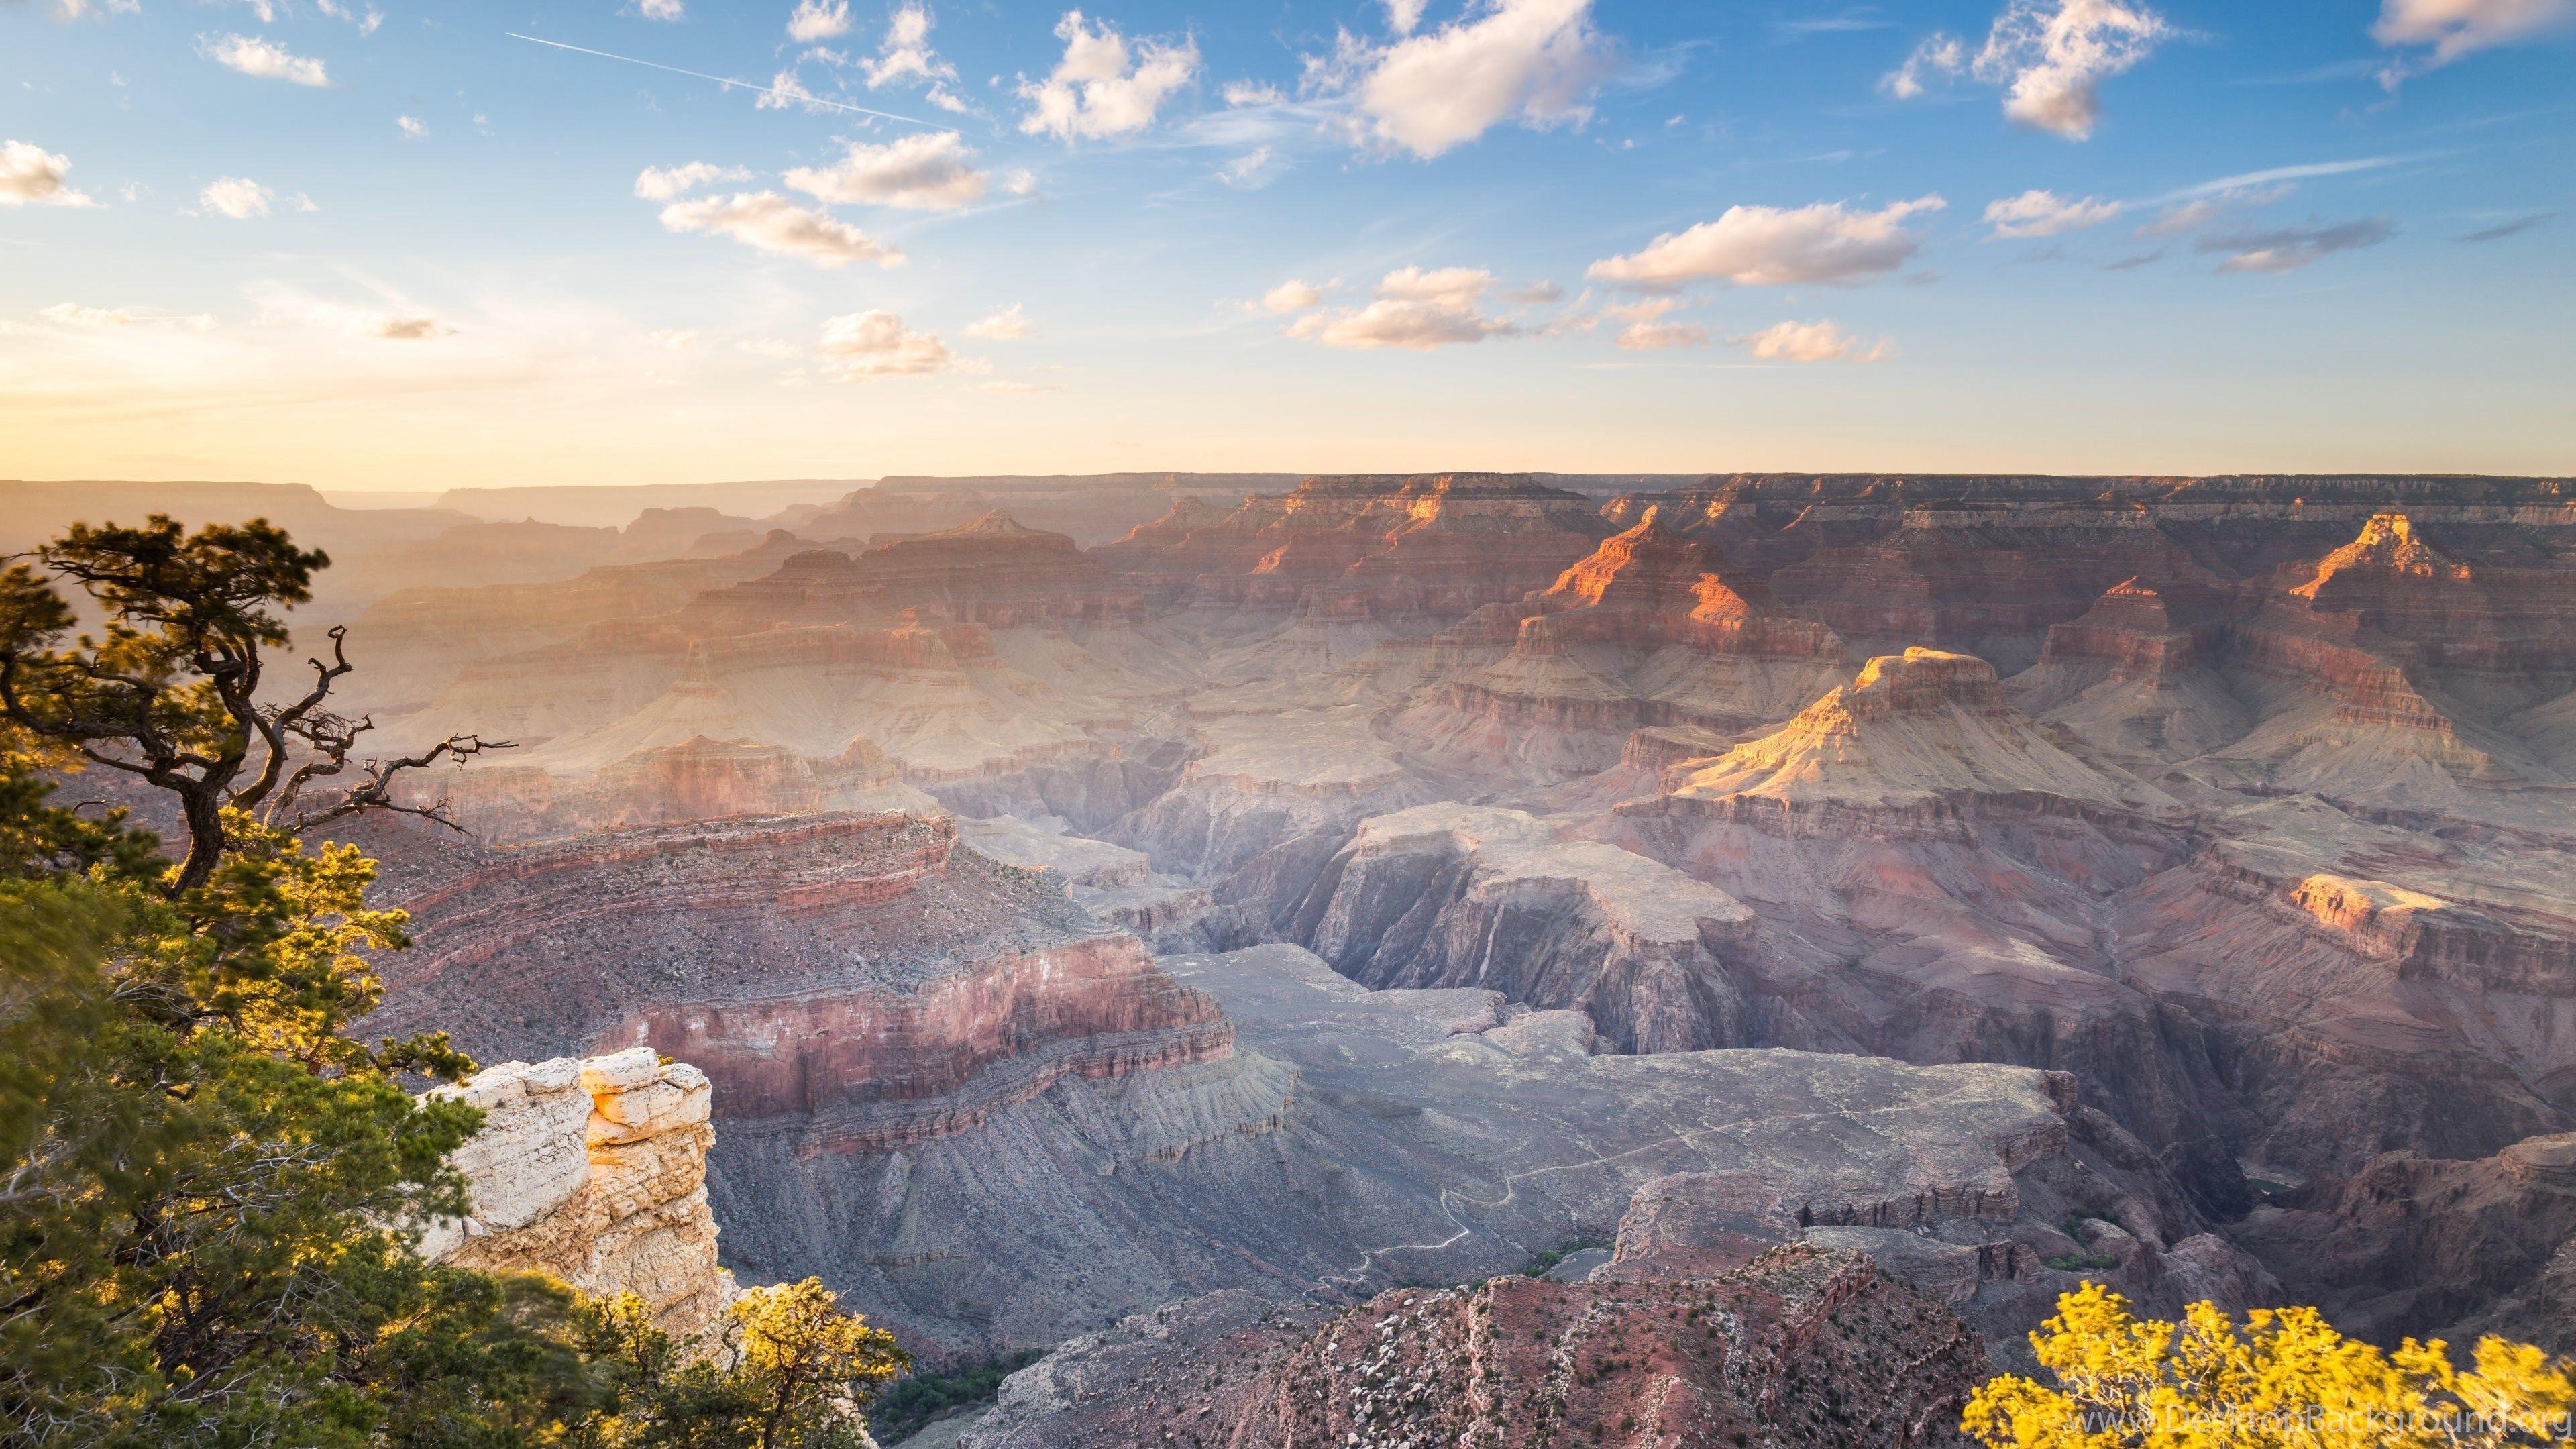 Grand Canyon UHD 8K Wallpapers - Top Free Grand Canyon UHD 8K Backgrounds -  WallpaperAccess